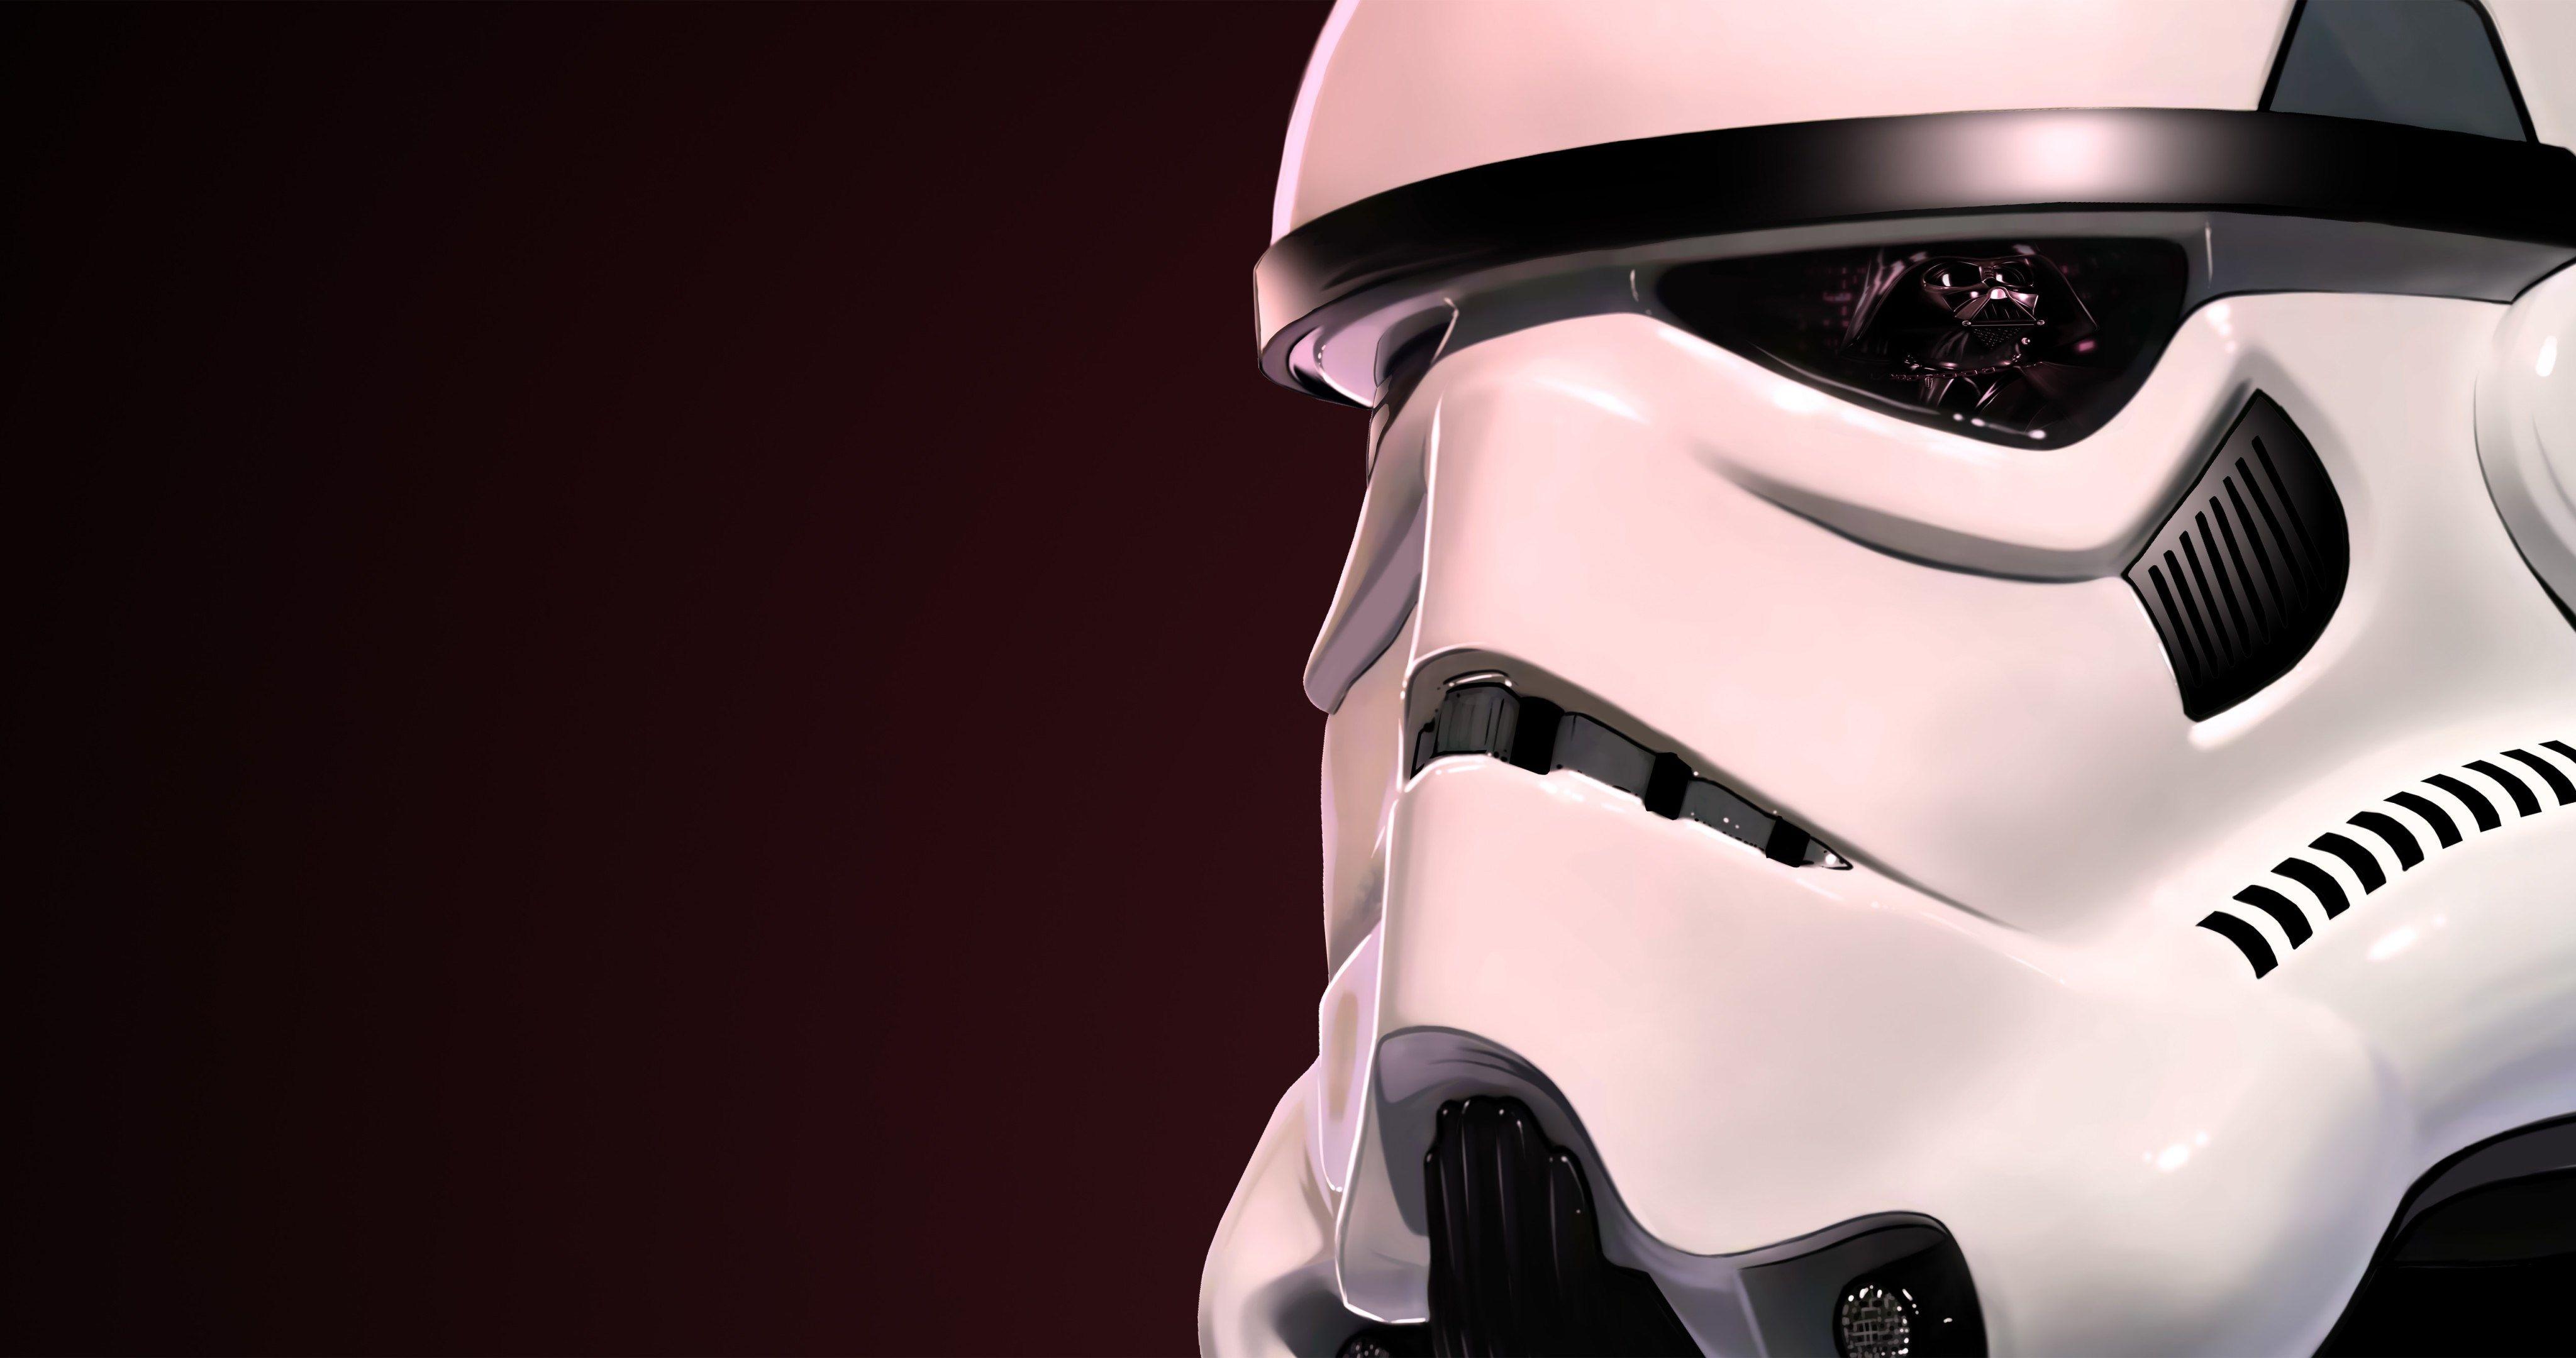 Storm Trooper Helmet 4k Ultra Hd Wallpaper Stormtrooper Star Wars Wallpaper Stormtrooper Helmet